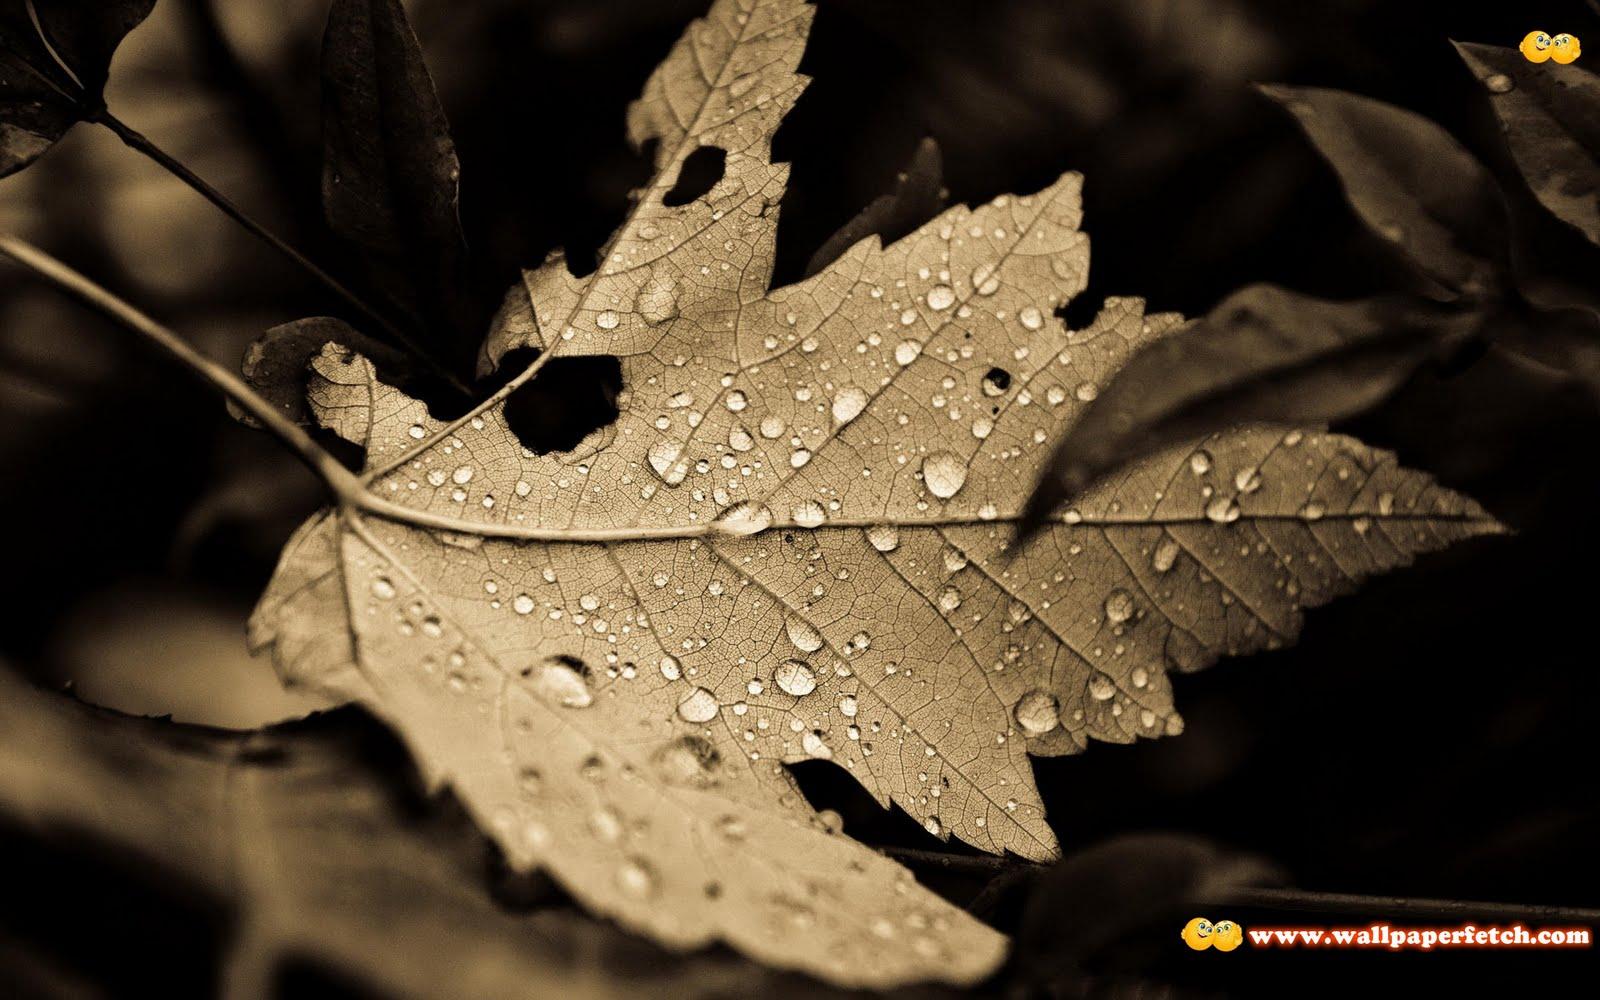 http://2.bp.blogspot.com/-t6OGopr-aNQ/TrxDjRB-bVI/AAAAAAAAJgY/l2izoboHYb0/s1600/SuperPack_Beautiful_Nature_HD_Wallpapers_Part__80.47.jpg